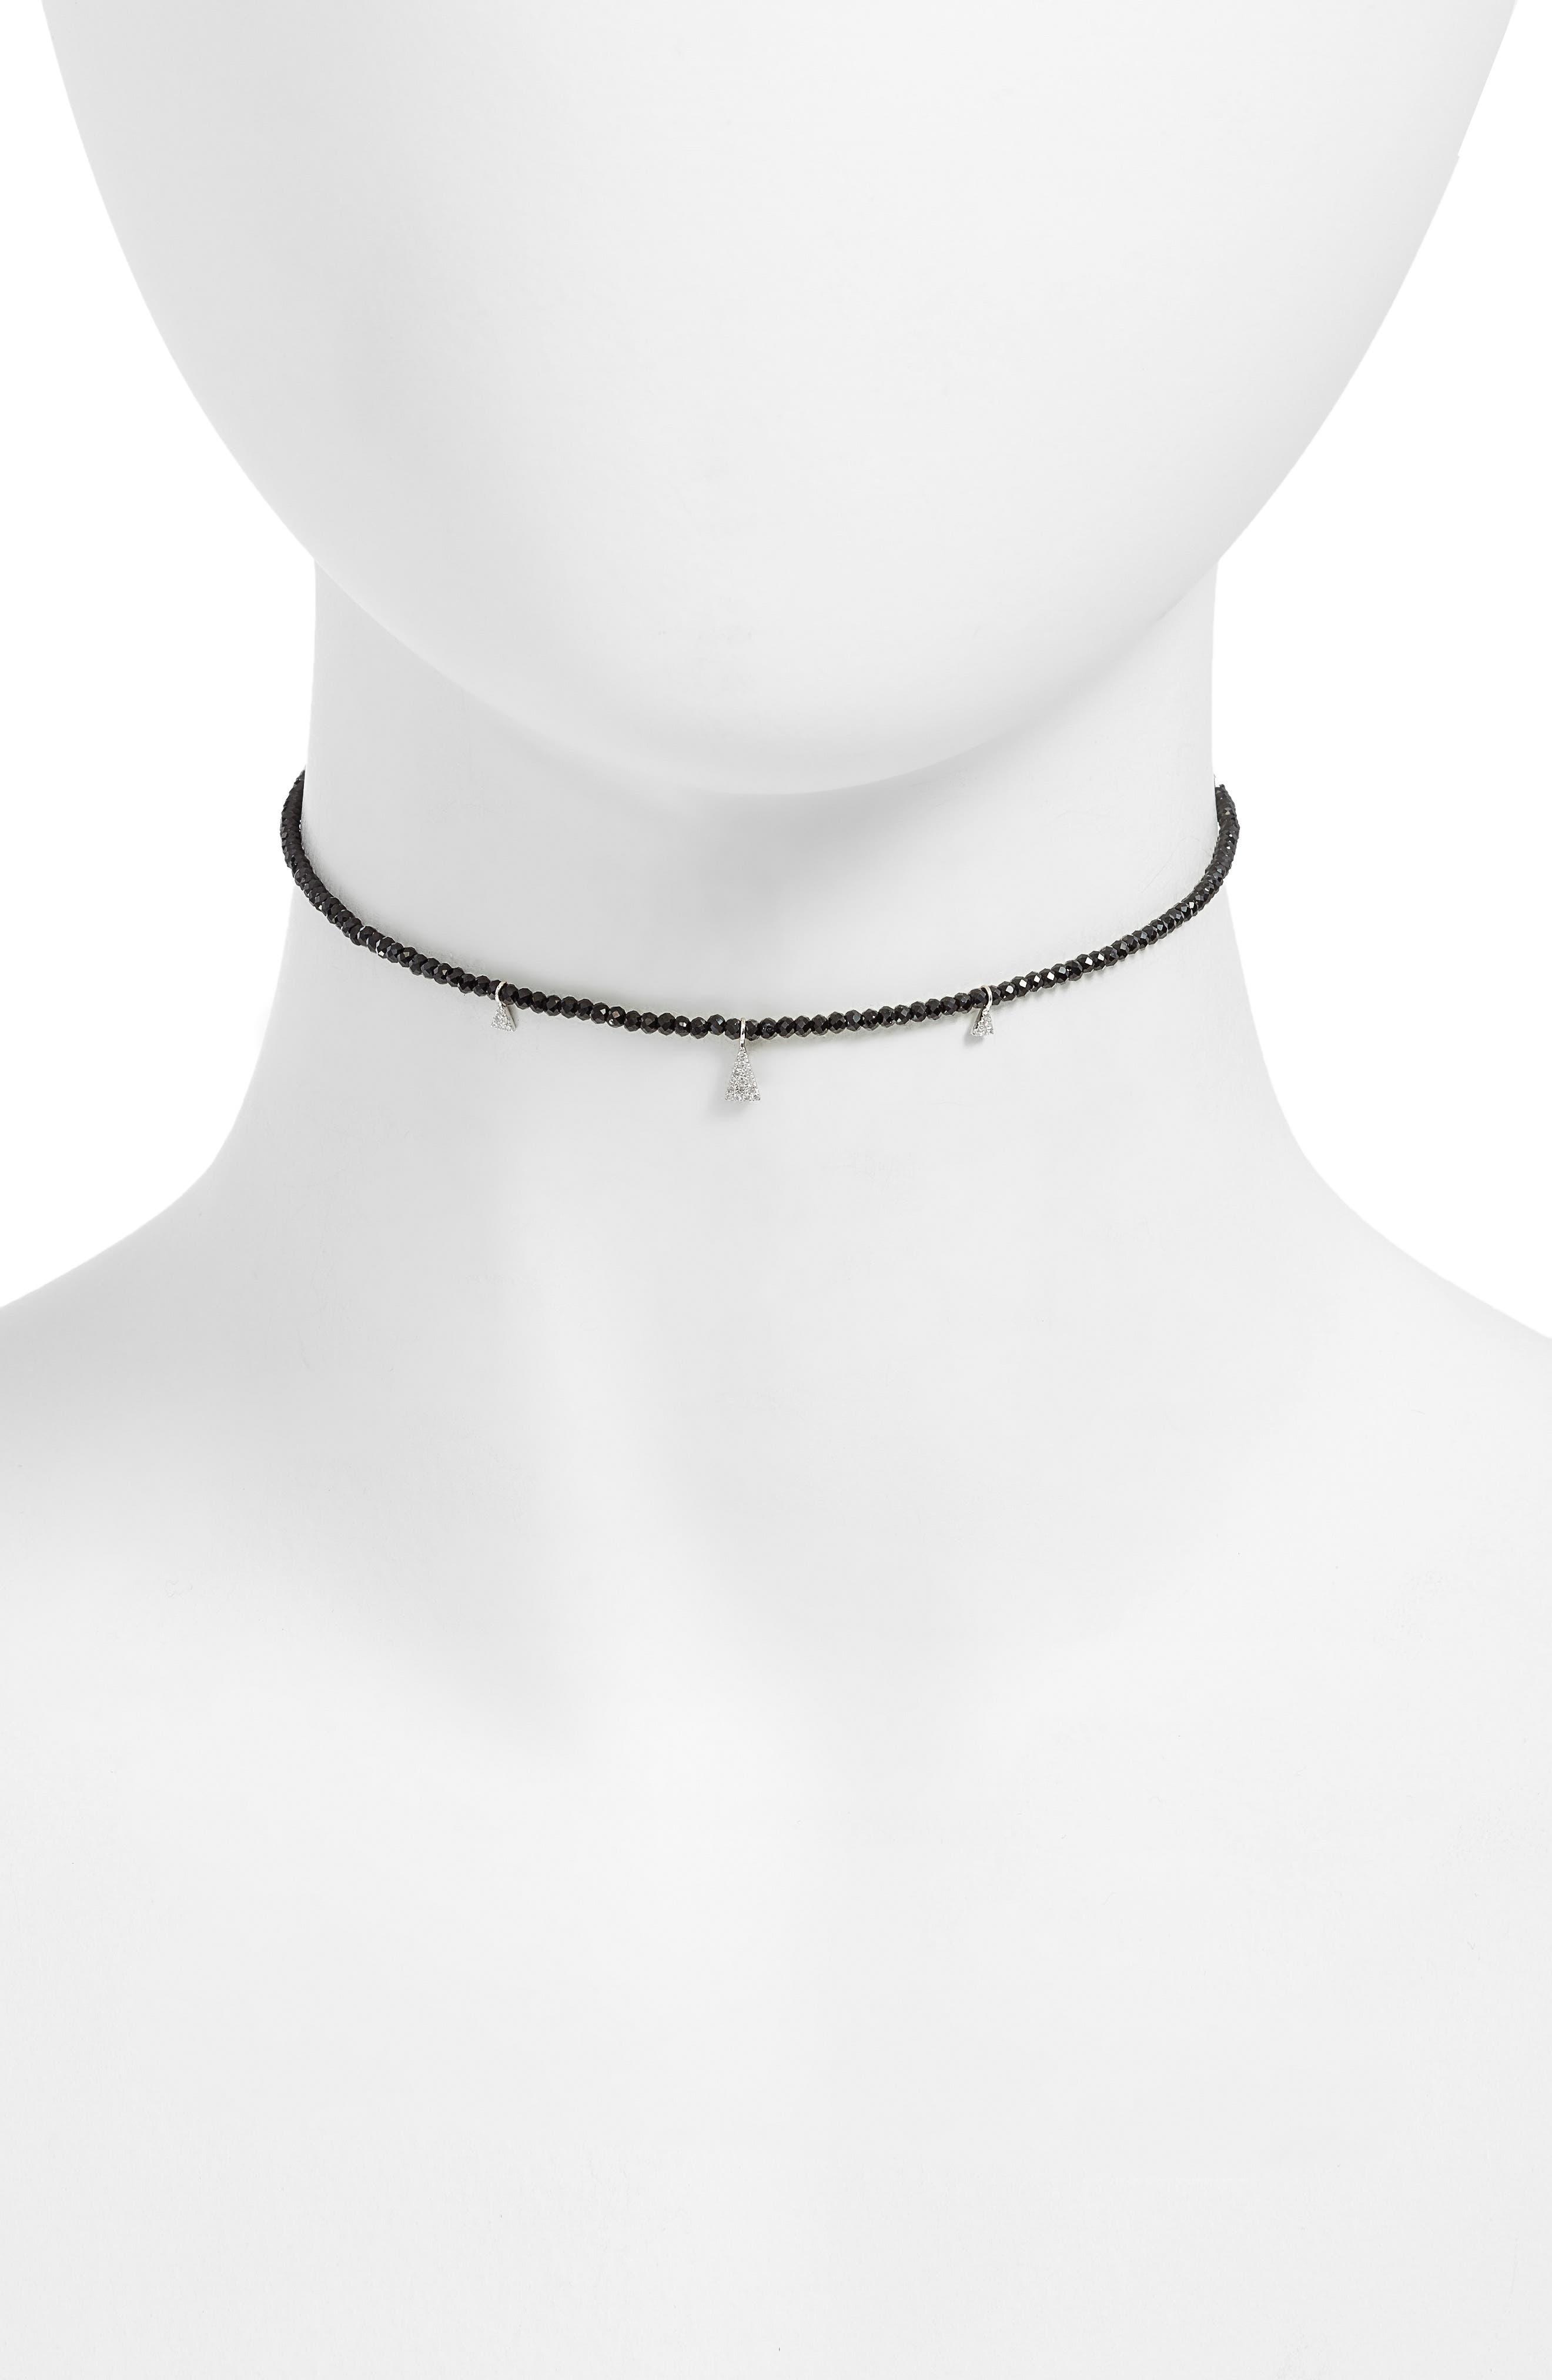 Alternate Image 1 Selected - Meira T Diamond Charm Choker Necklace